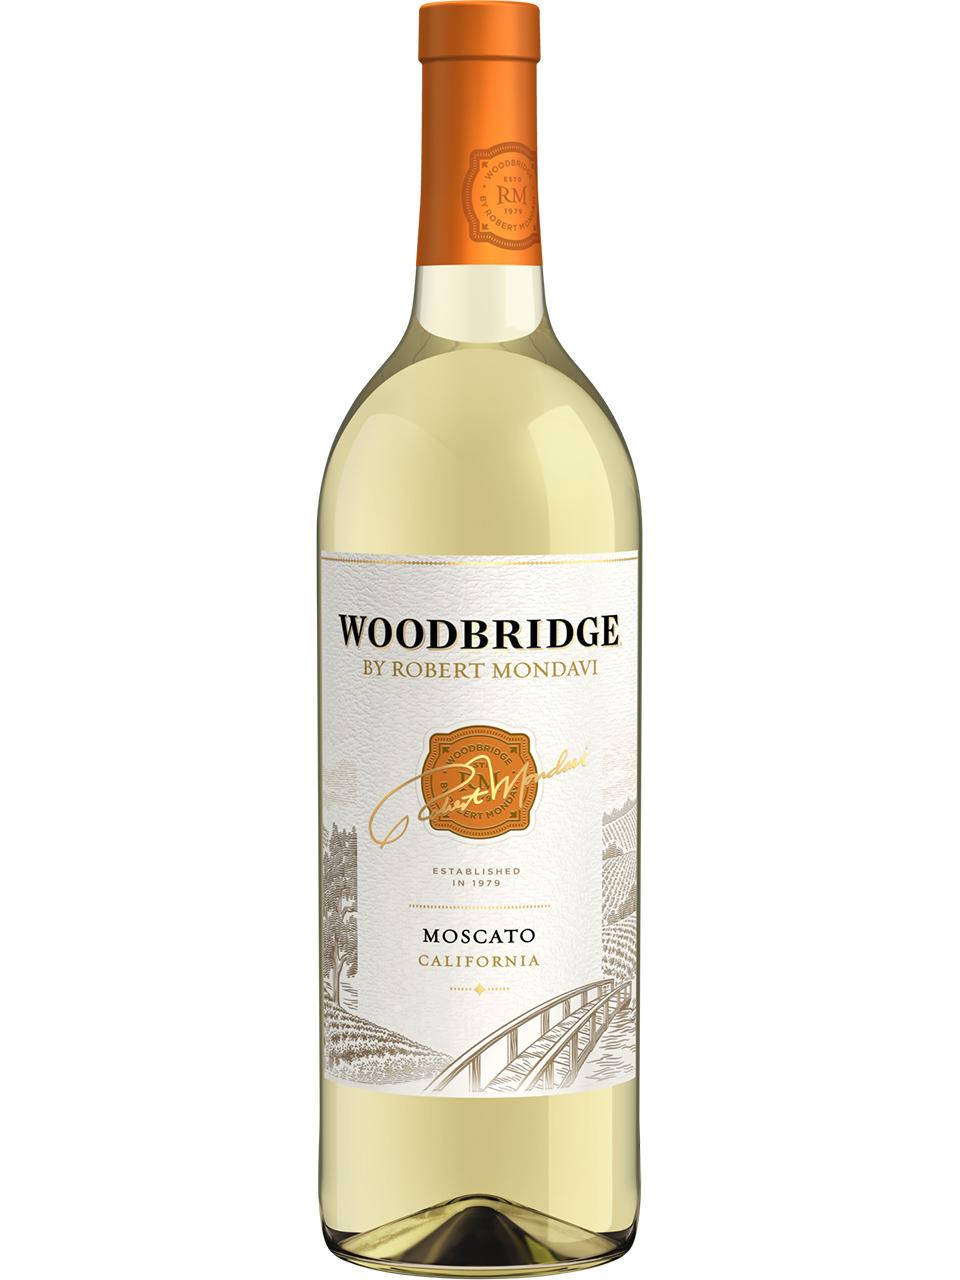 Woodbridge Robert Mondavi Moscato